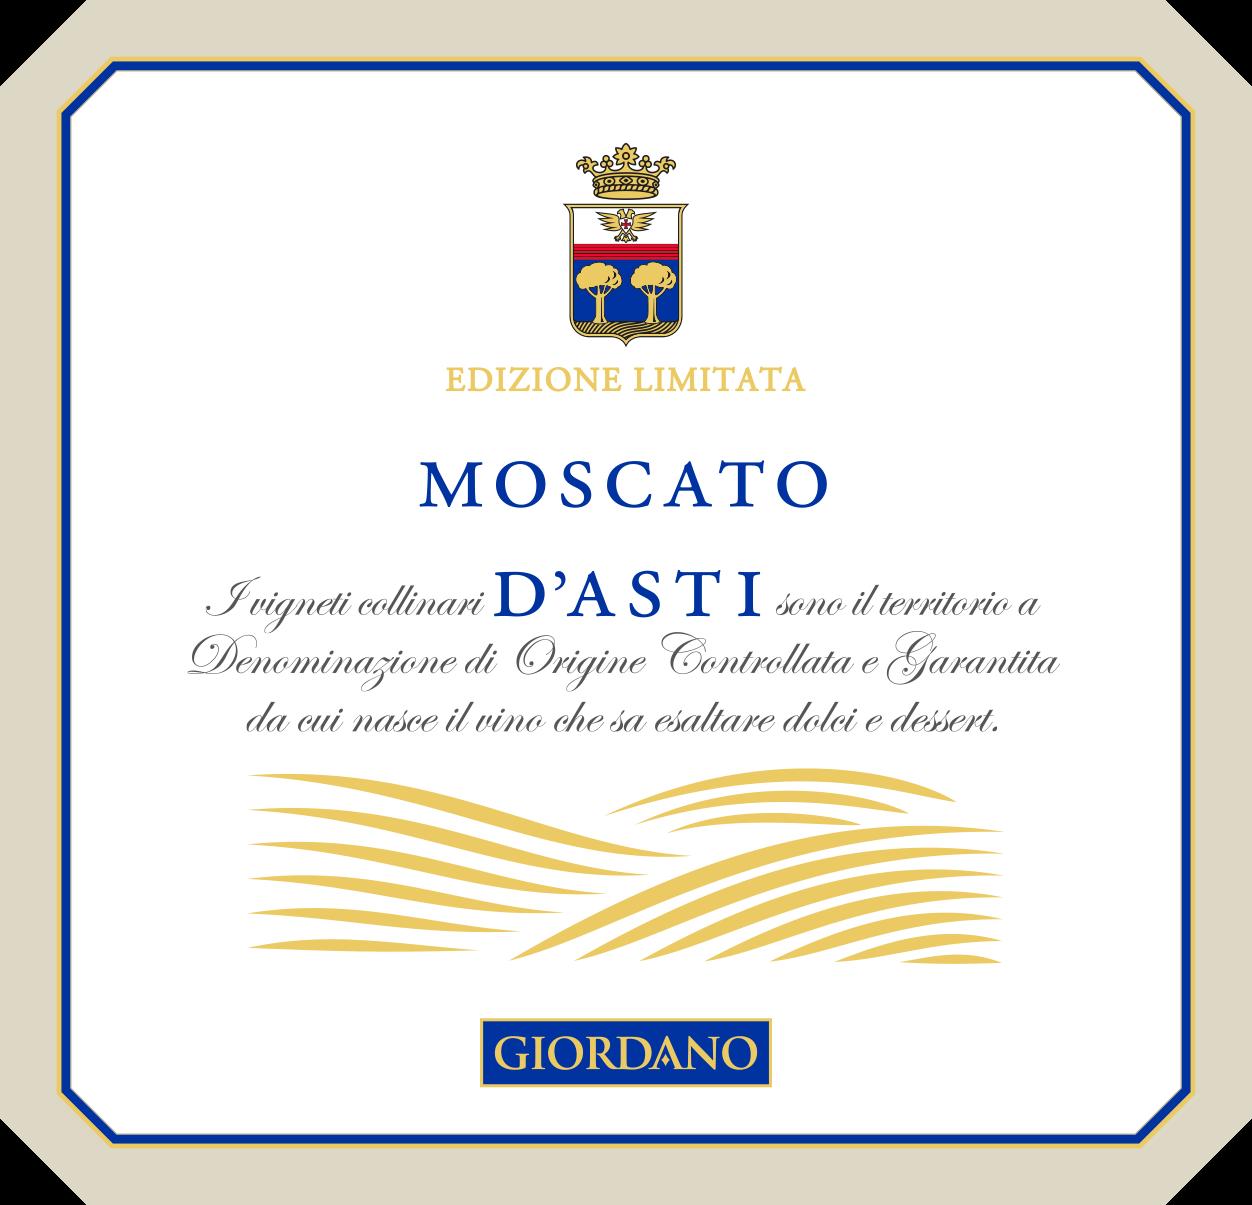 Giordano Moscato d'Asti